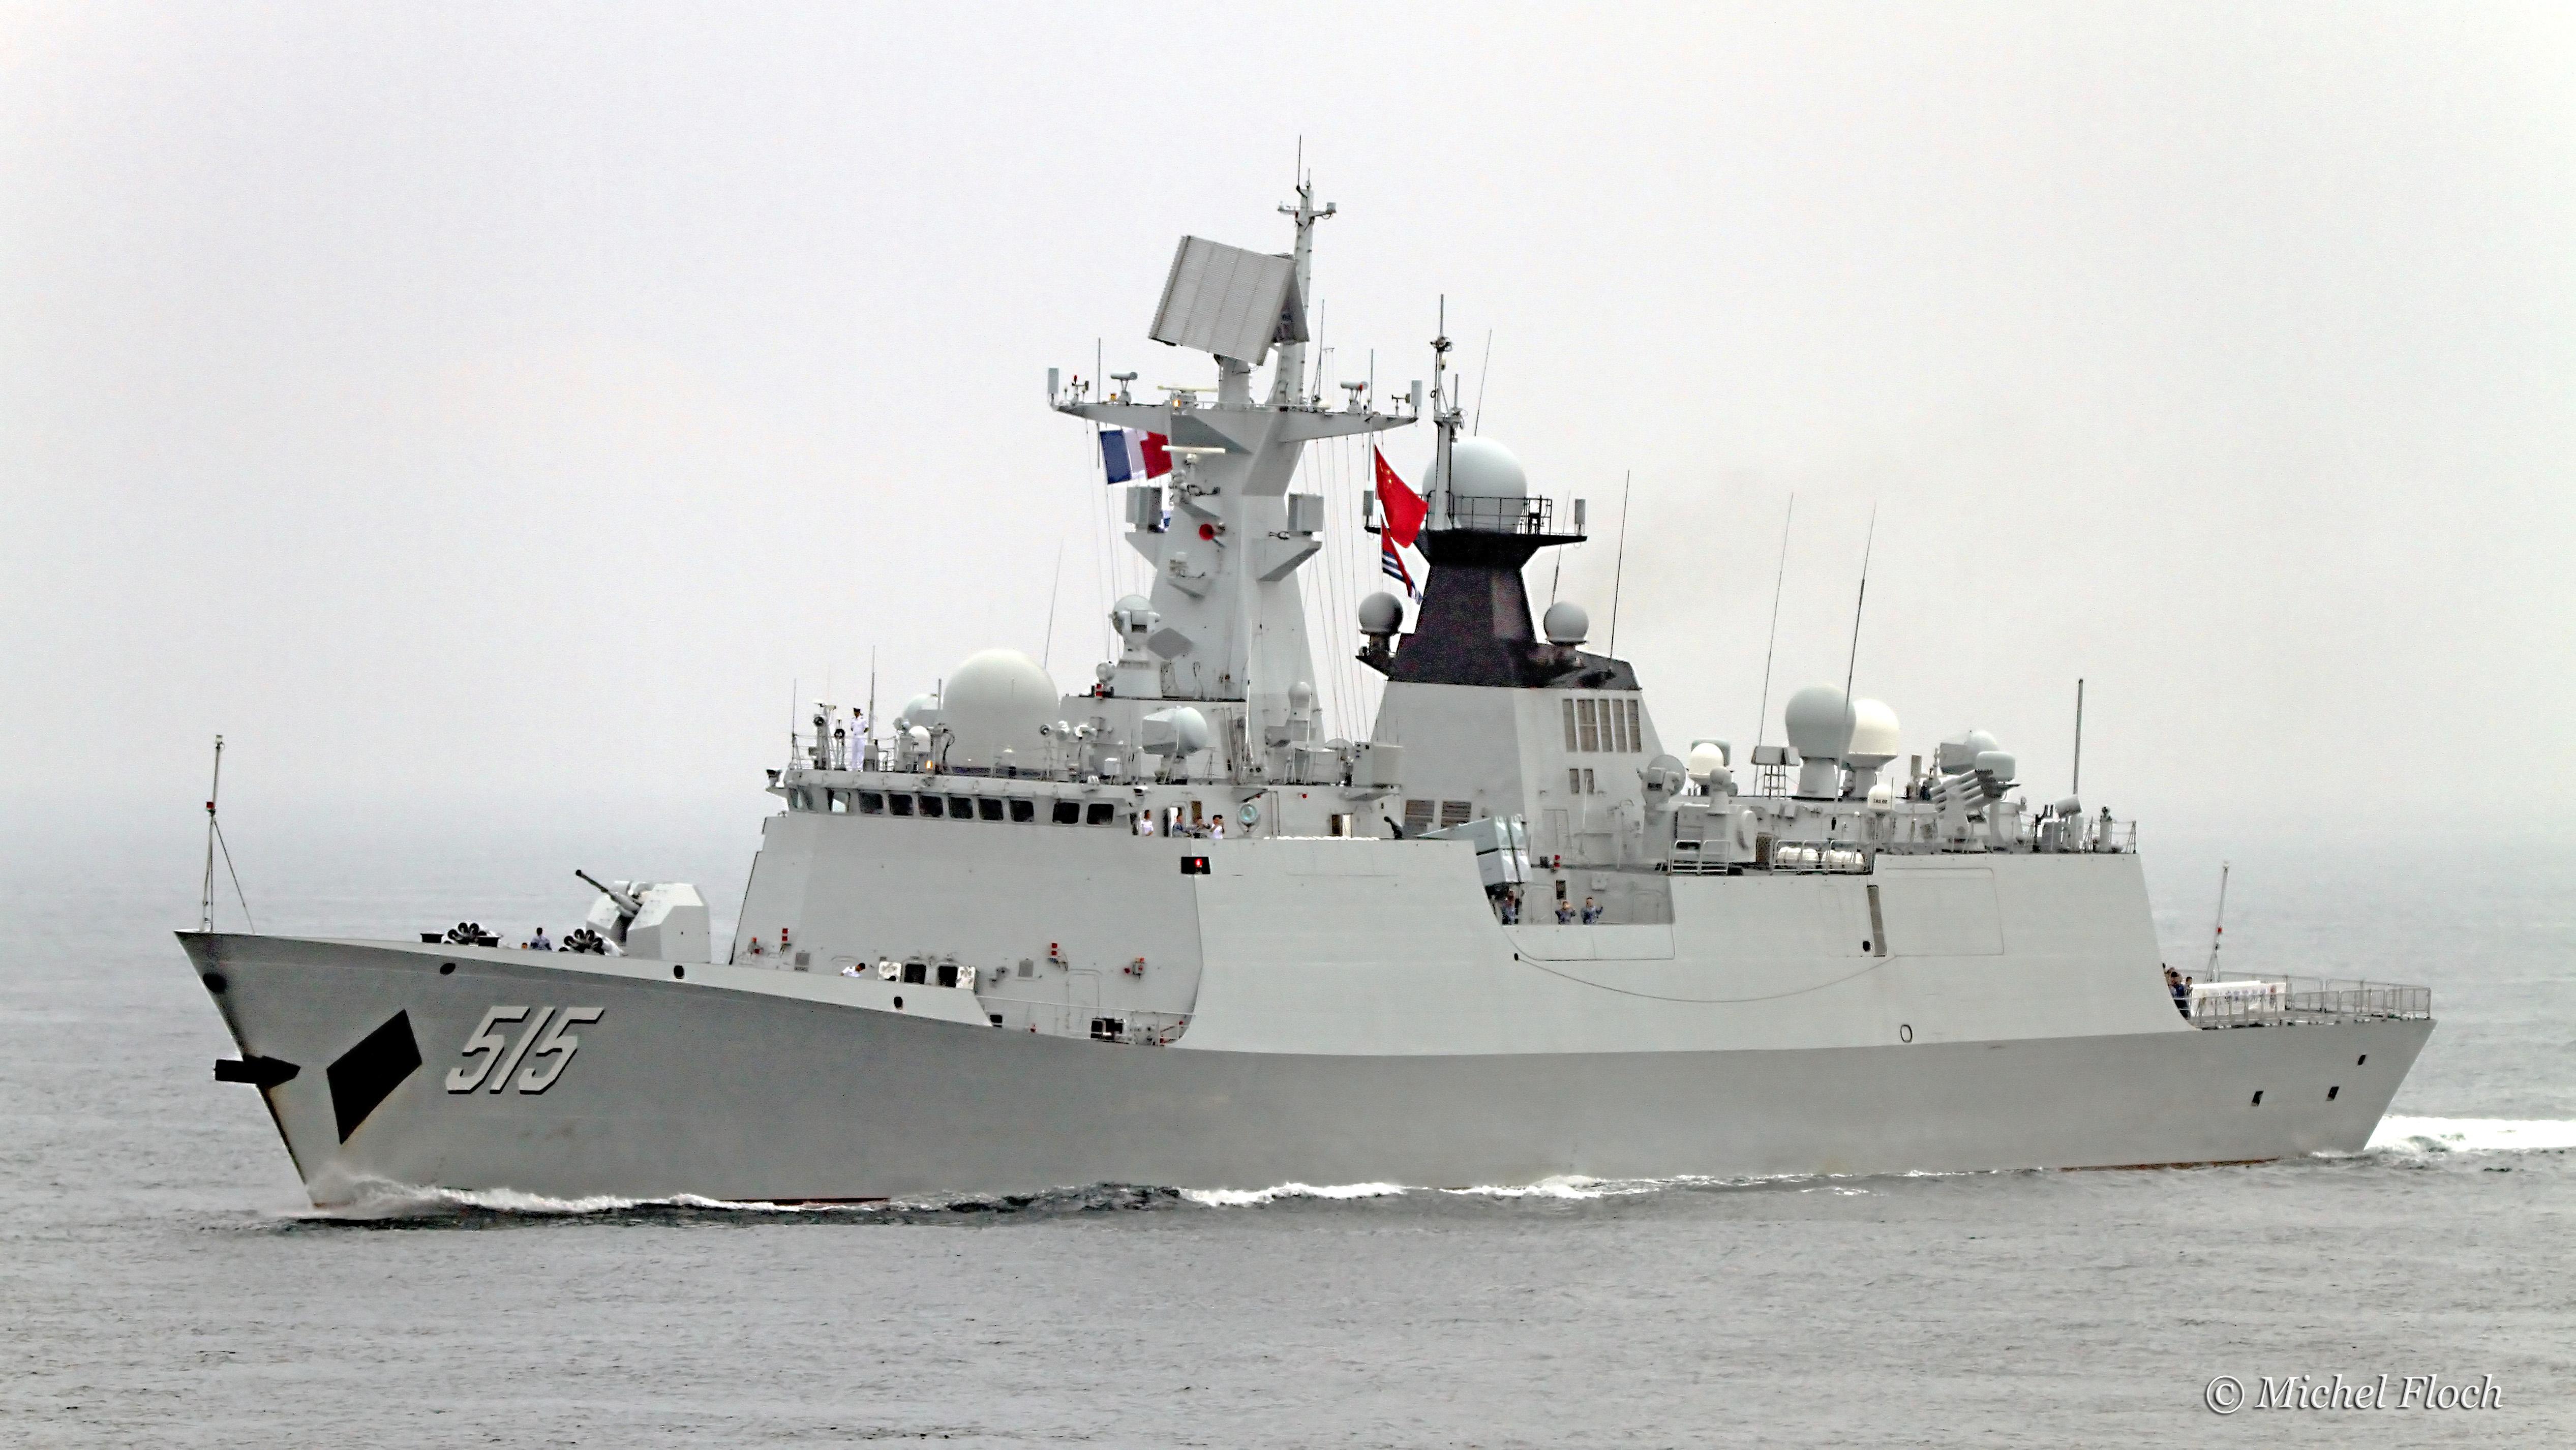 Marine chinoise - Chinese navy - Page 16 30738220727_bb11e65c8e_o